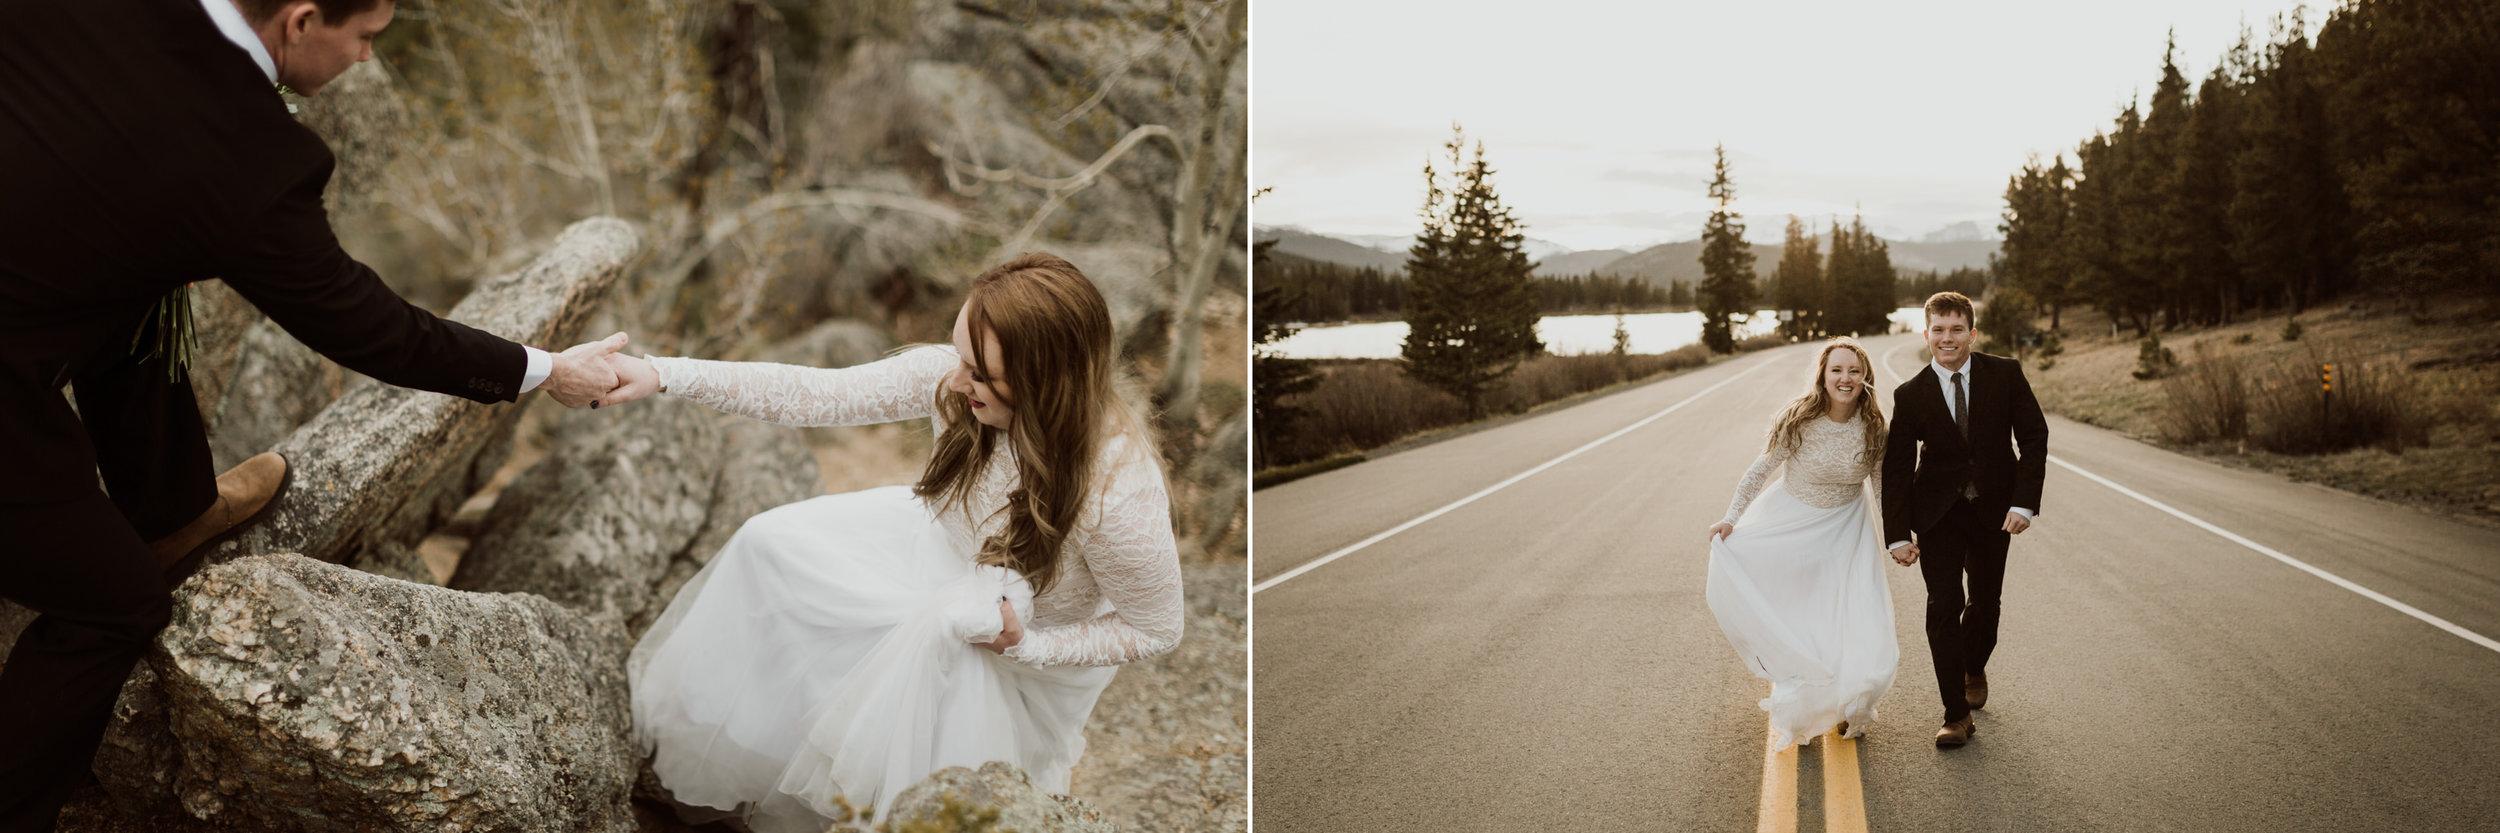 17-5-adventure-wedding-photographer-18.jpg